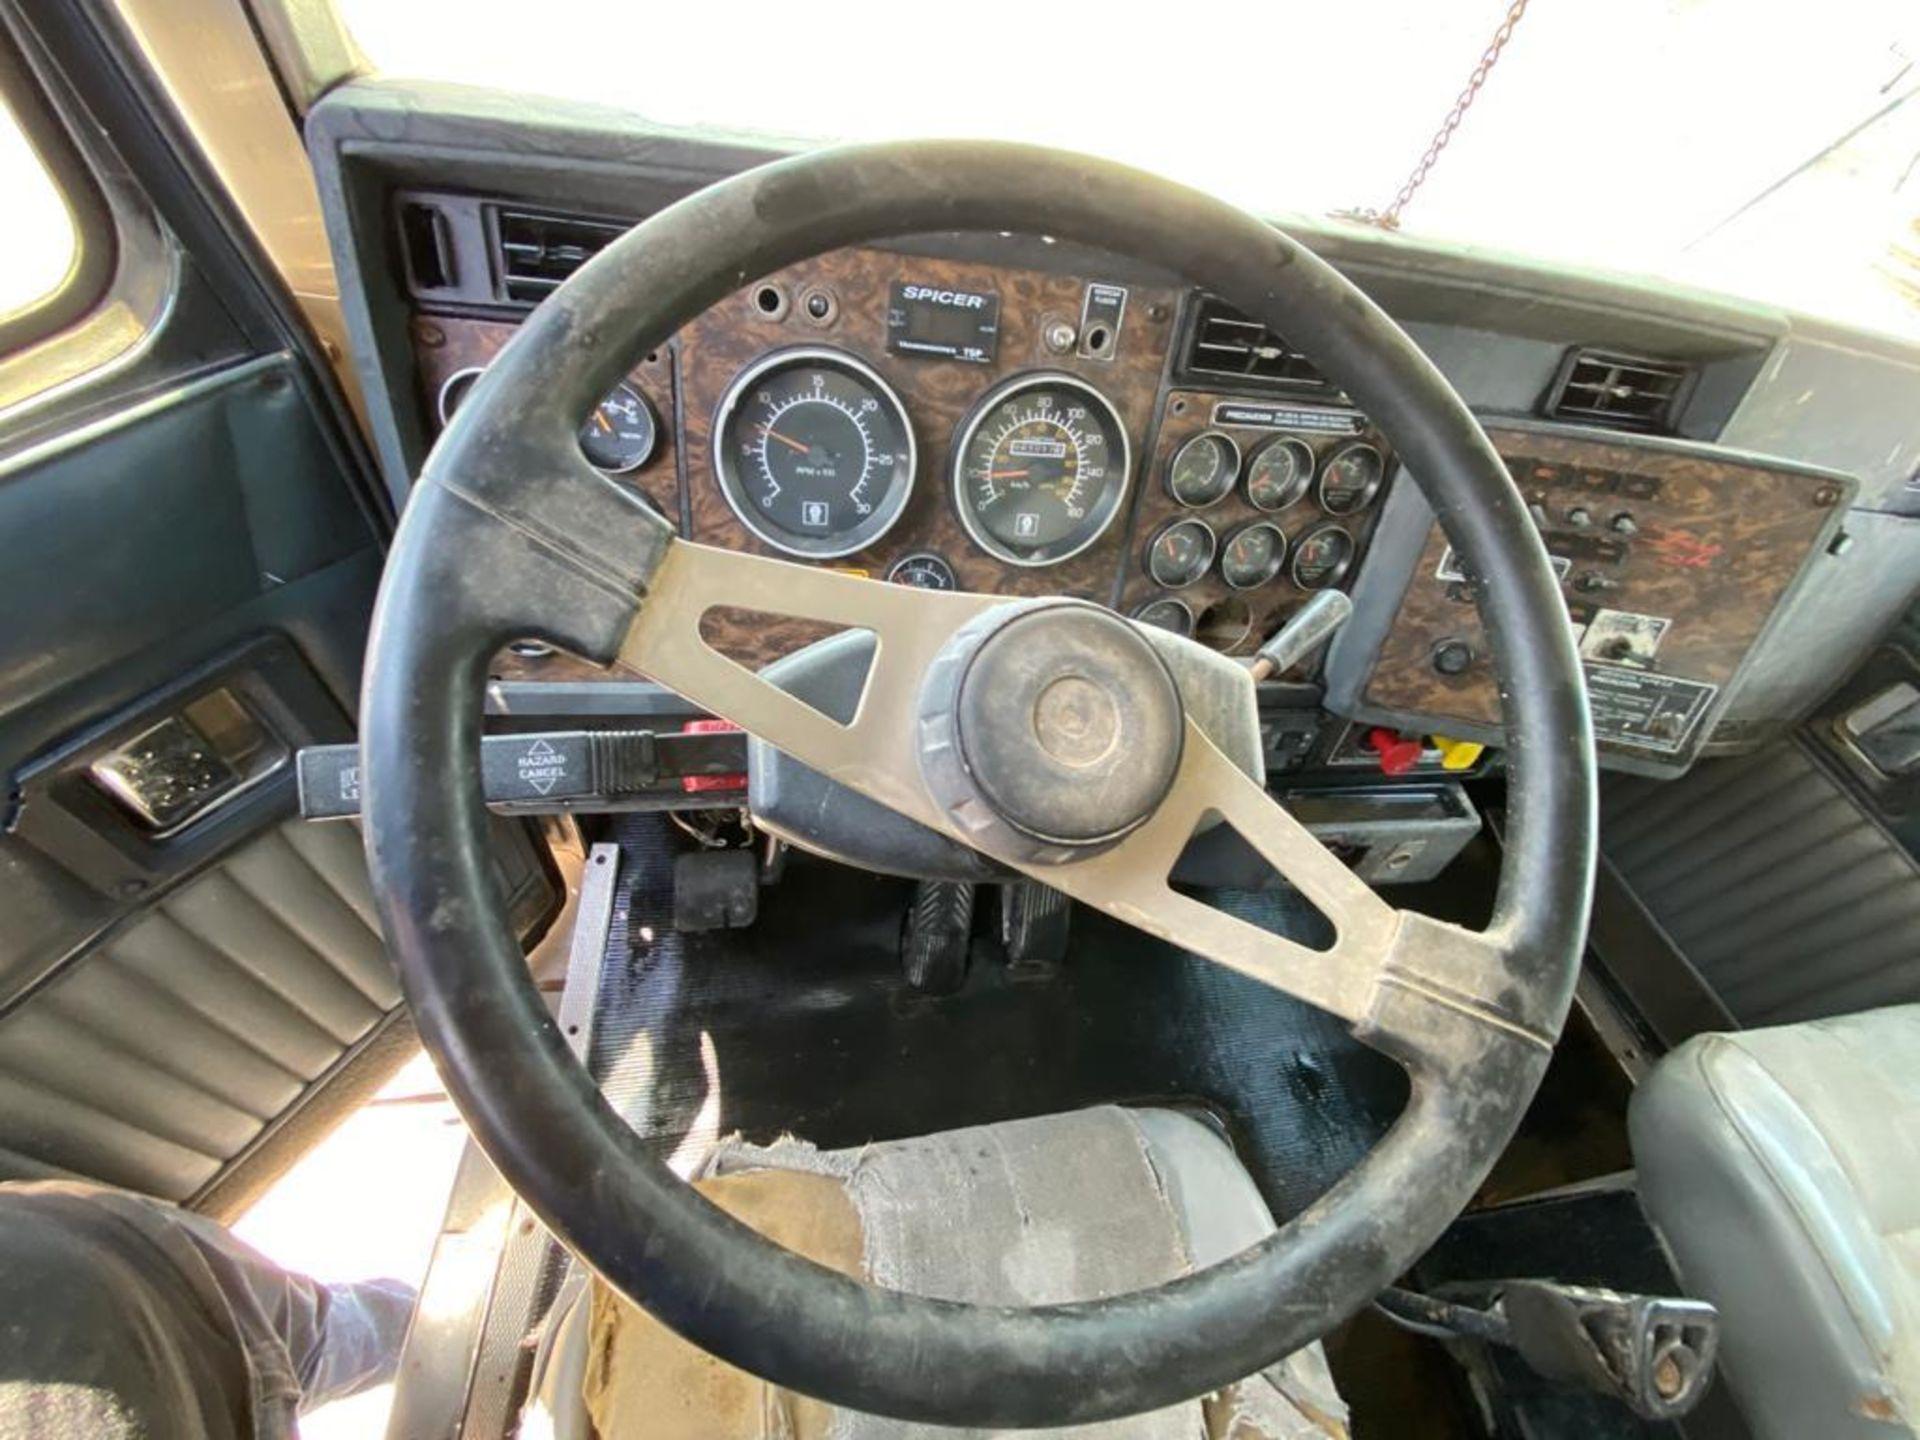 1998 Kenworth 5000 Gallon, standard transmission of 16 speeds - Image 36 of 68